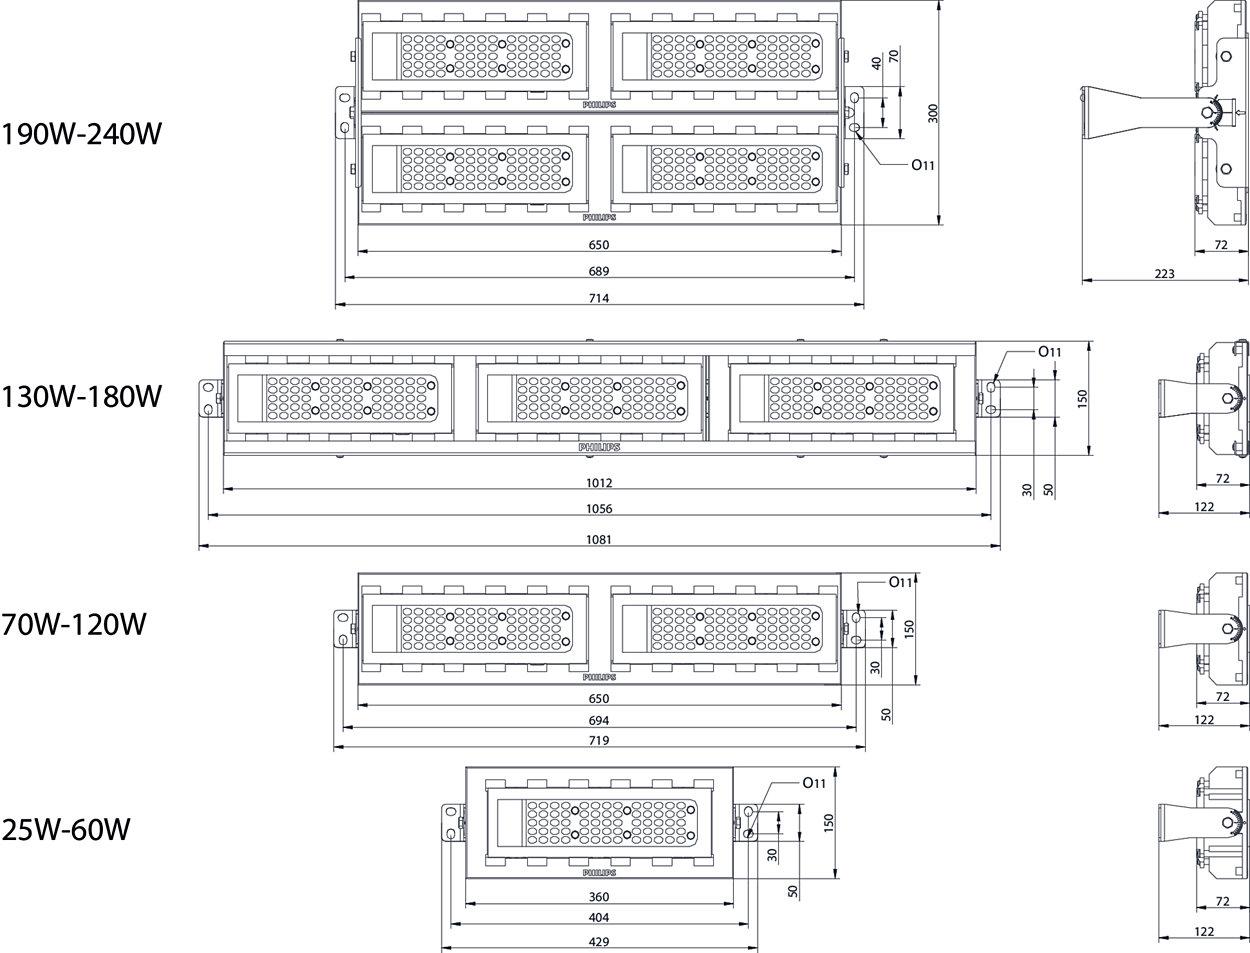 Bwp352 Led97 Nw 80w 220 240v Dm2 Mp1 Flowbase Philips Lighting Tunnel Diagram Up Tunnels For Optimum Safety